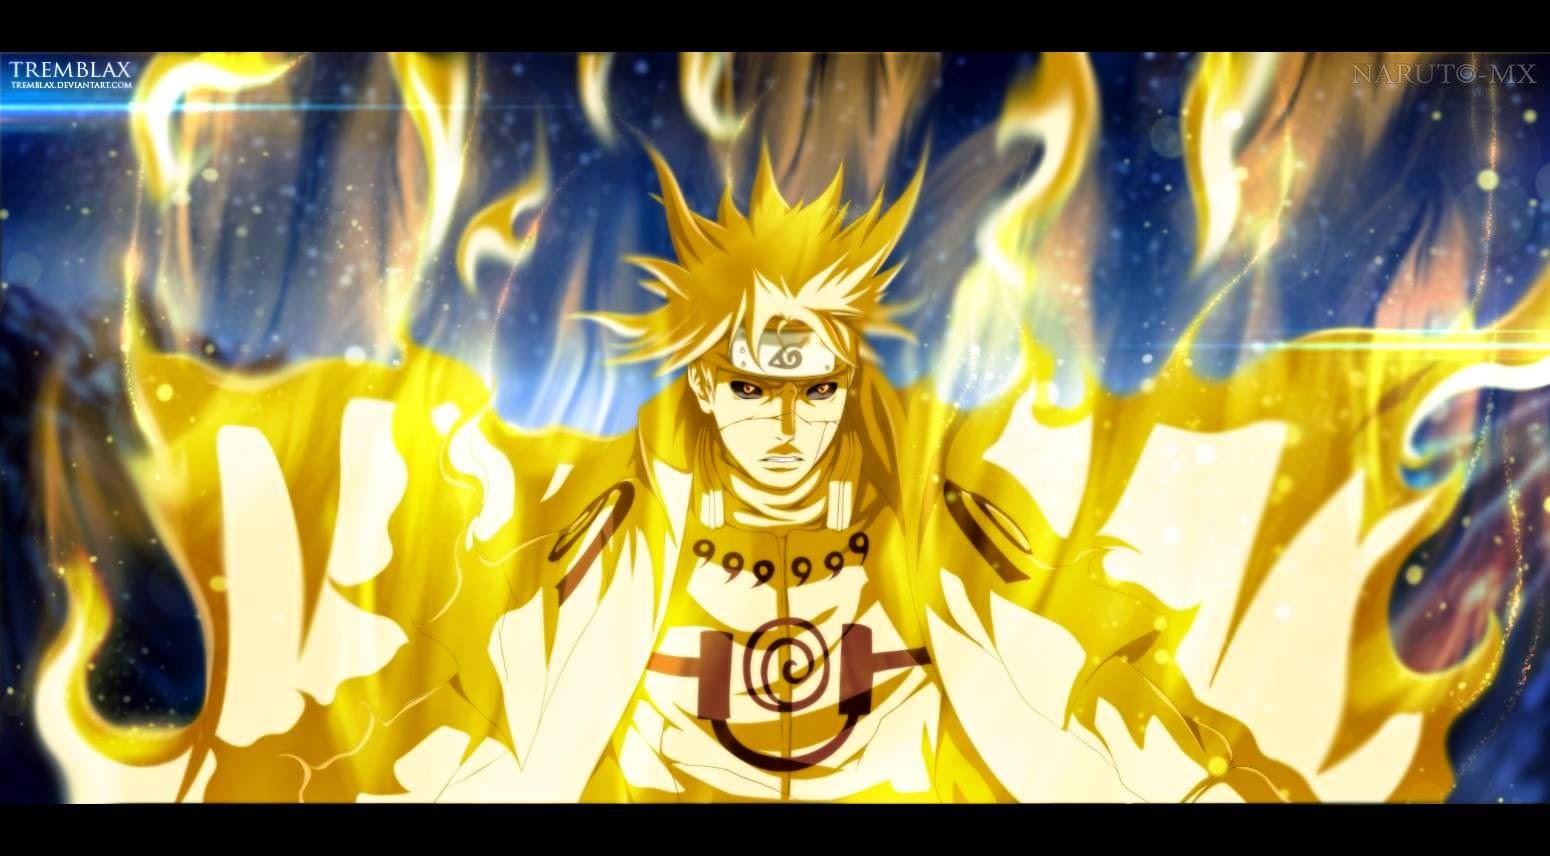 Fantastic Wallpaper Naruto Yellow - Wallpaper%2BNaruto%2BShippuden%2B4  Image.jpg